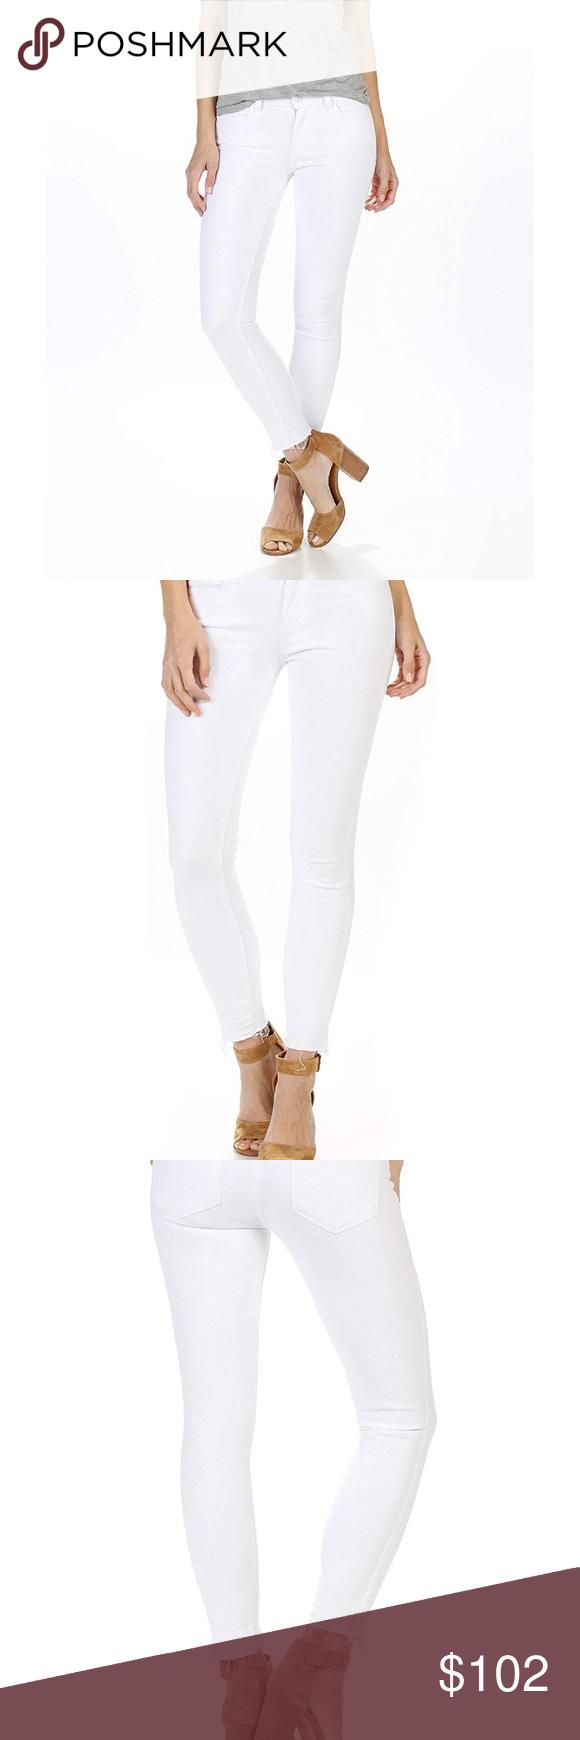 ba080bc9063 PAIGE Verdugo Crop Skinny Jeans W/Undone Hem These are great Paige crisp  white